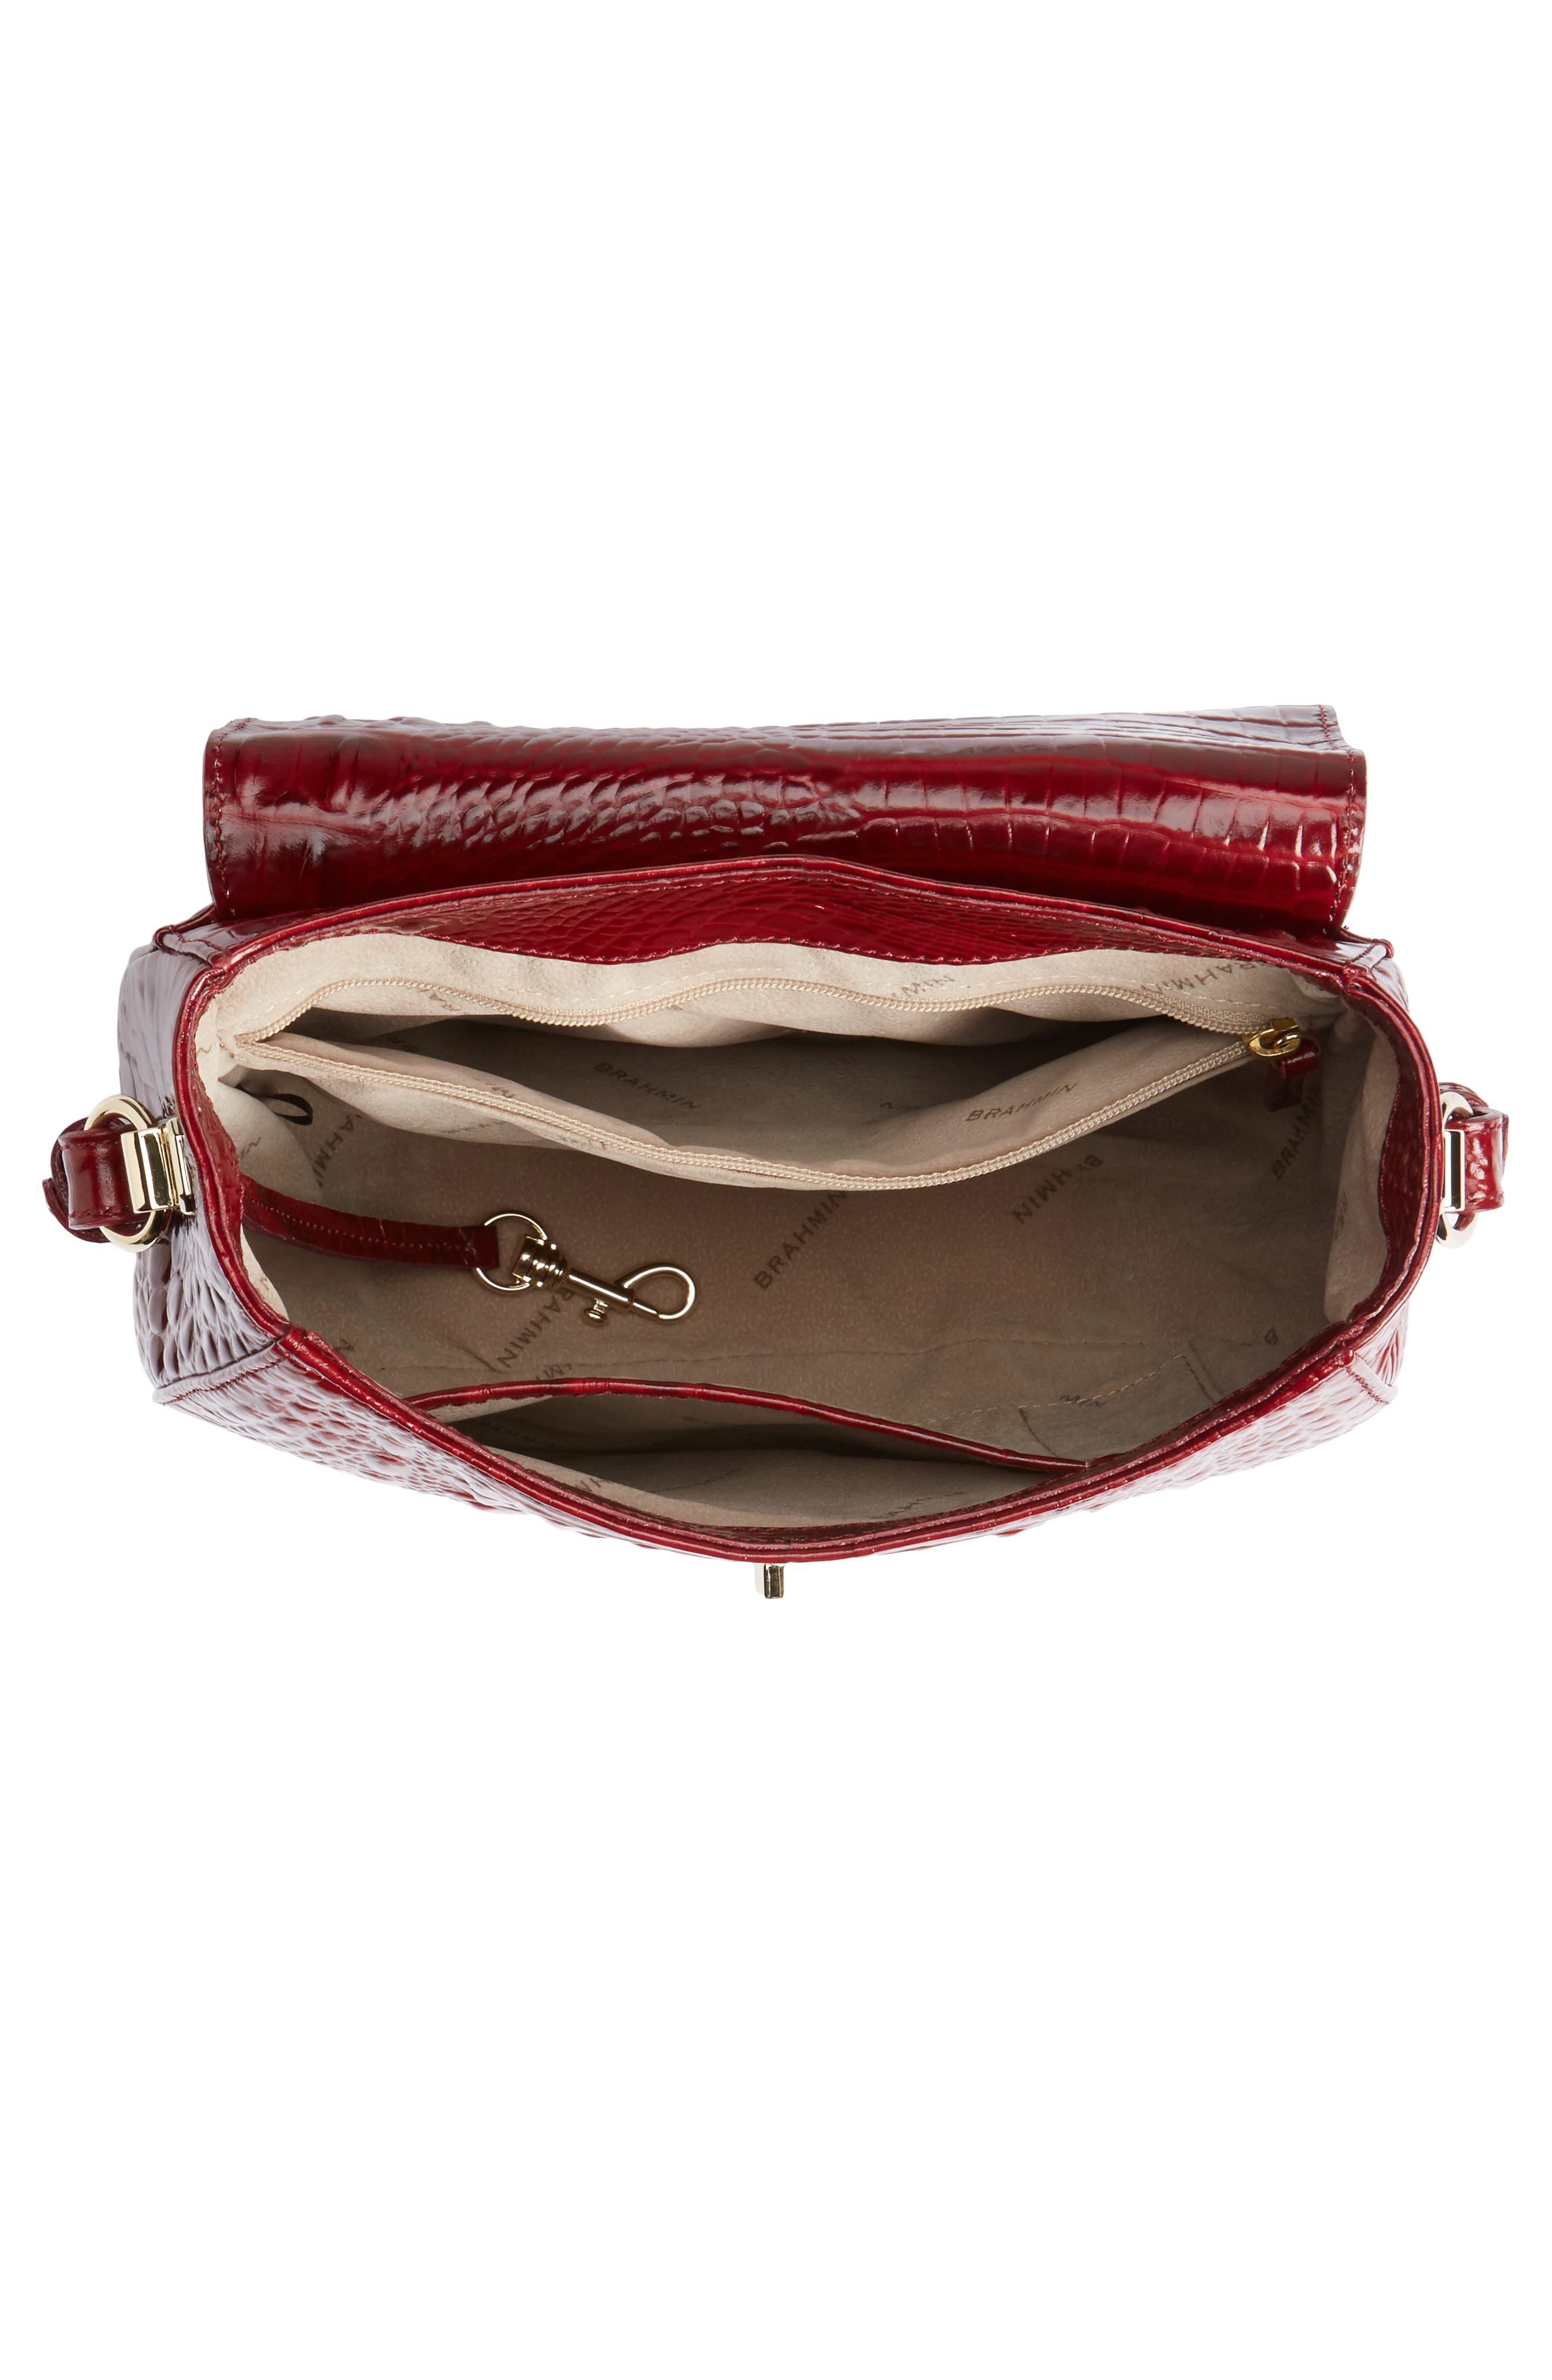 Melbourne - Lizzie Leather Crossbody Bag,                             Alternate thumbnail 20, color,